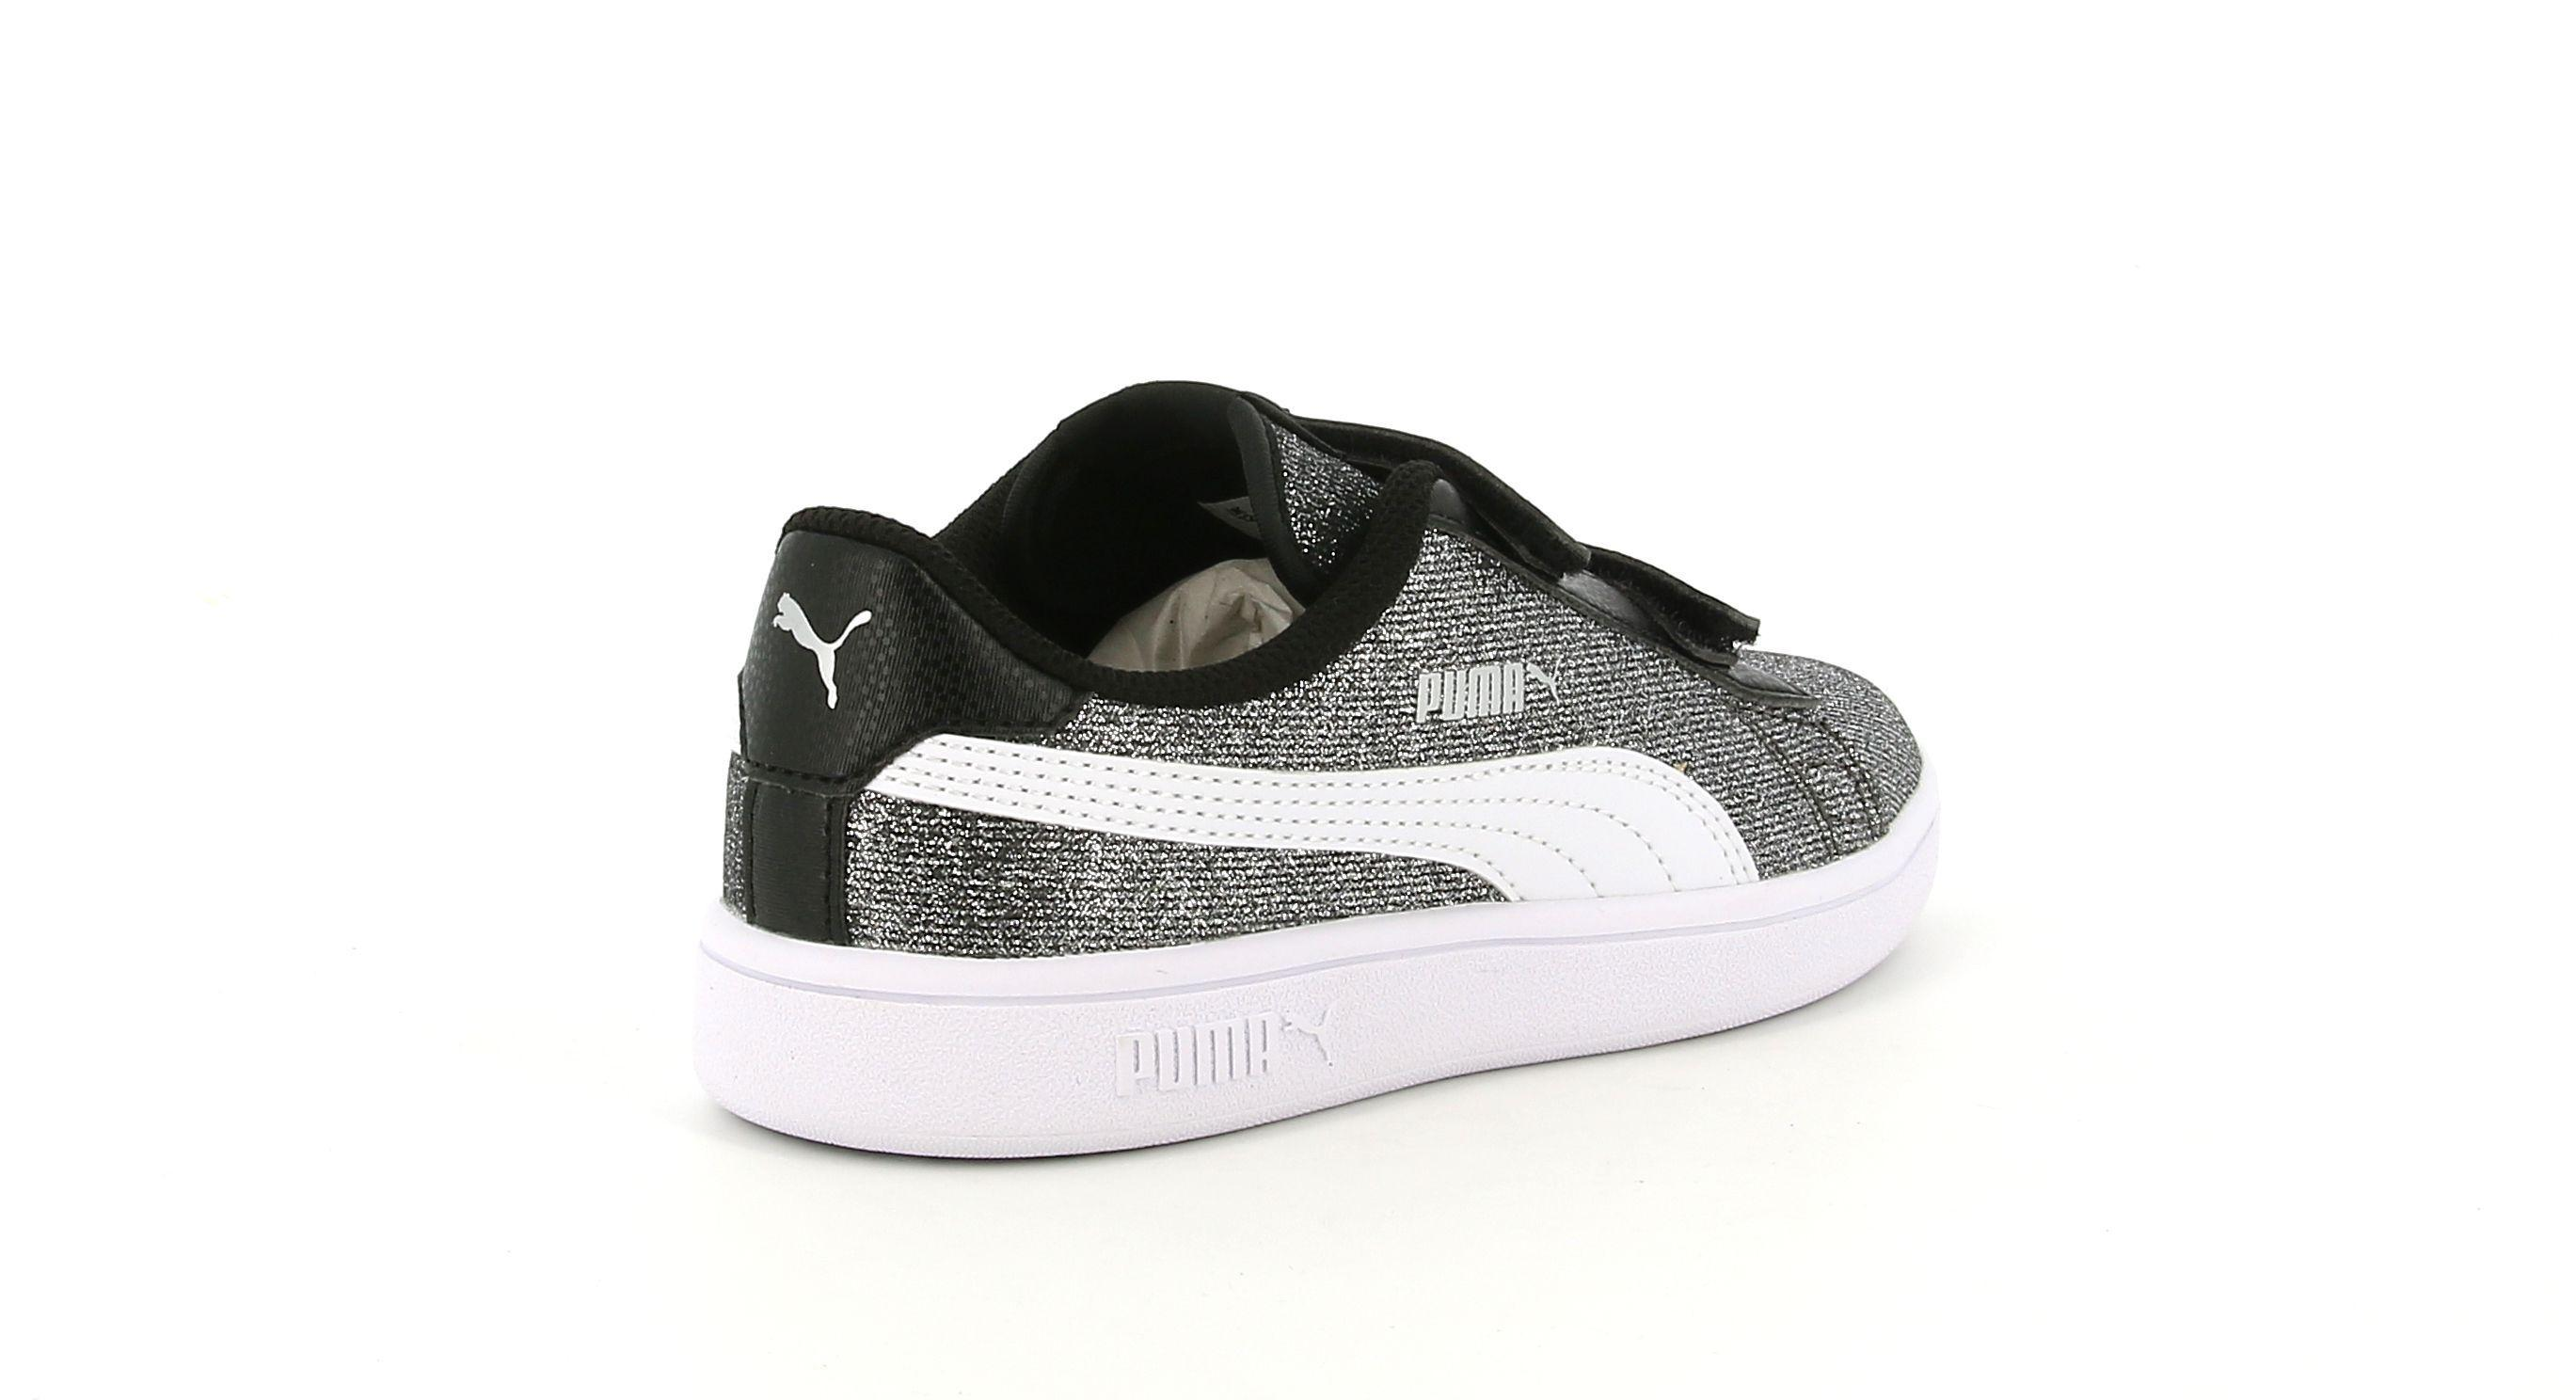 puma puma 367378 004 smash glitz glamm v ps sneakers bassa da bambina grigio